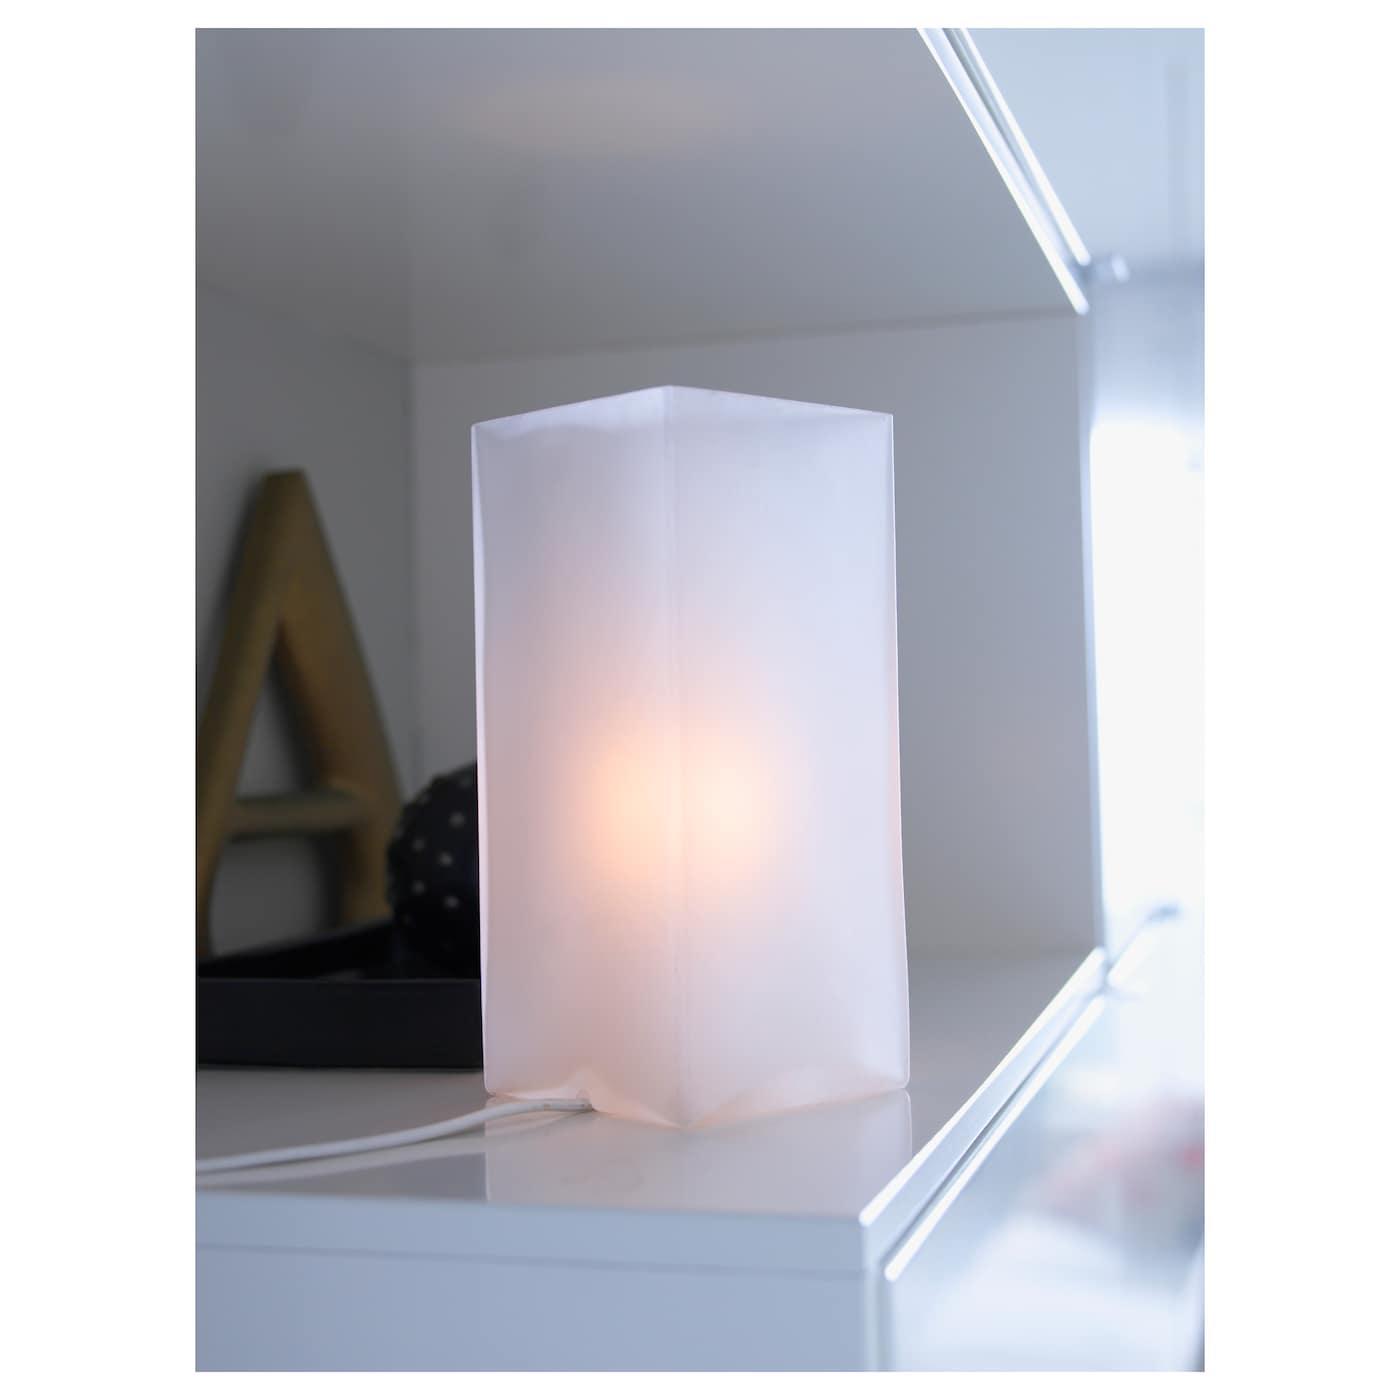 Ikea Grönö Light Bulb Size